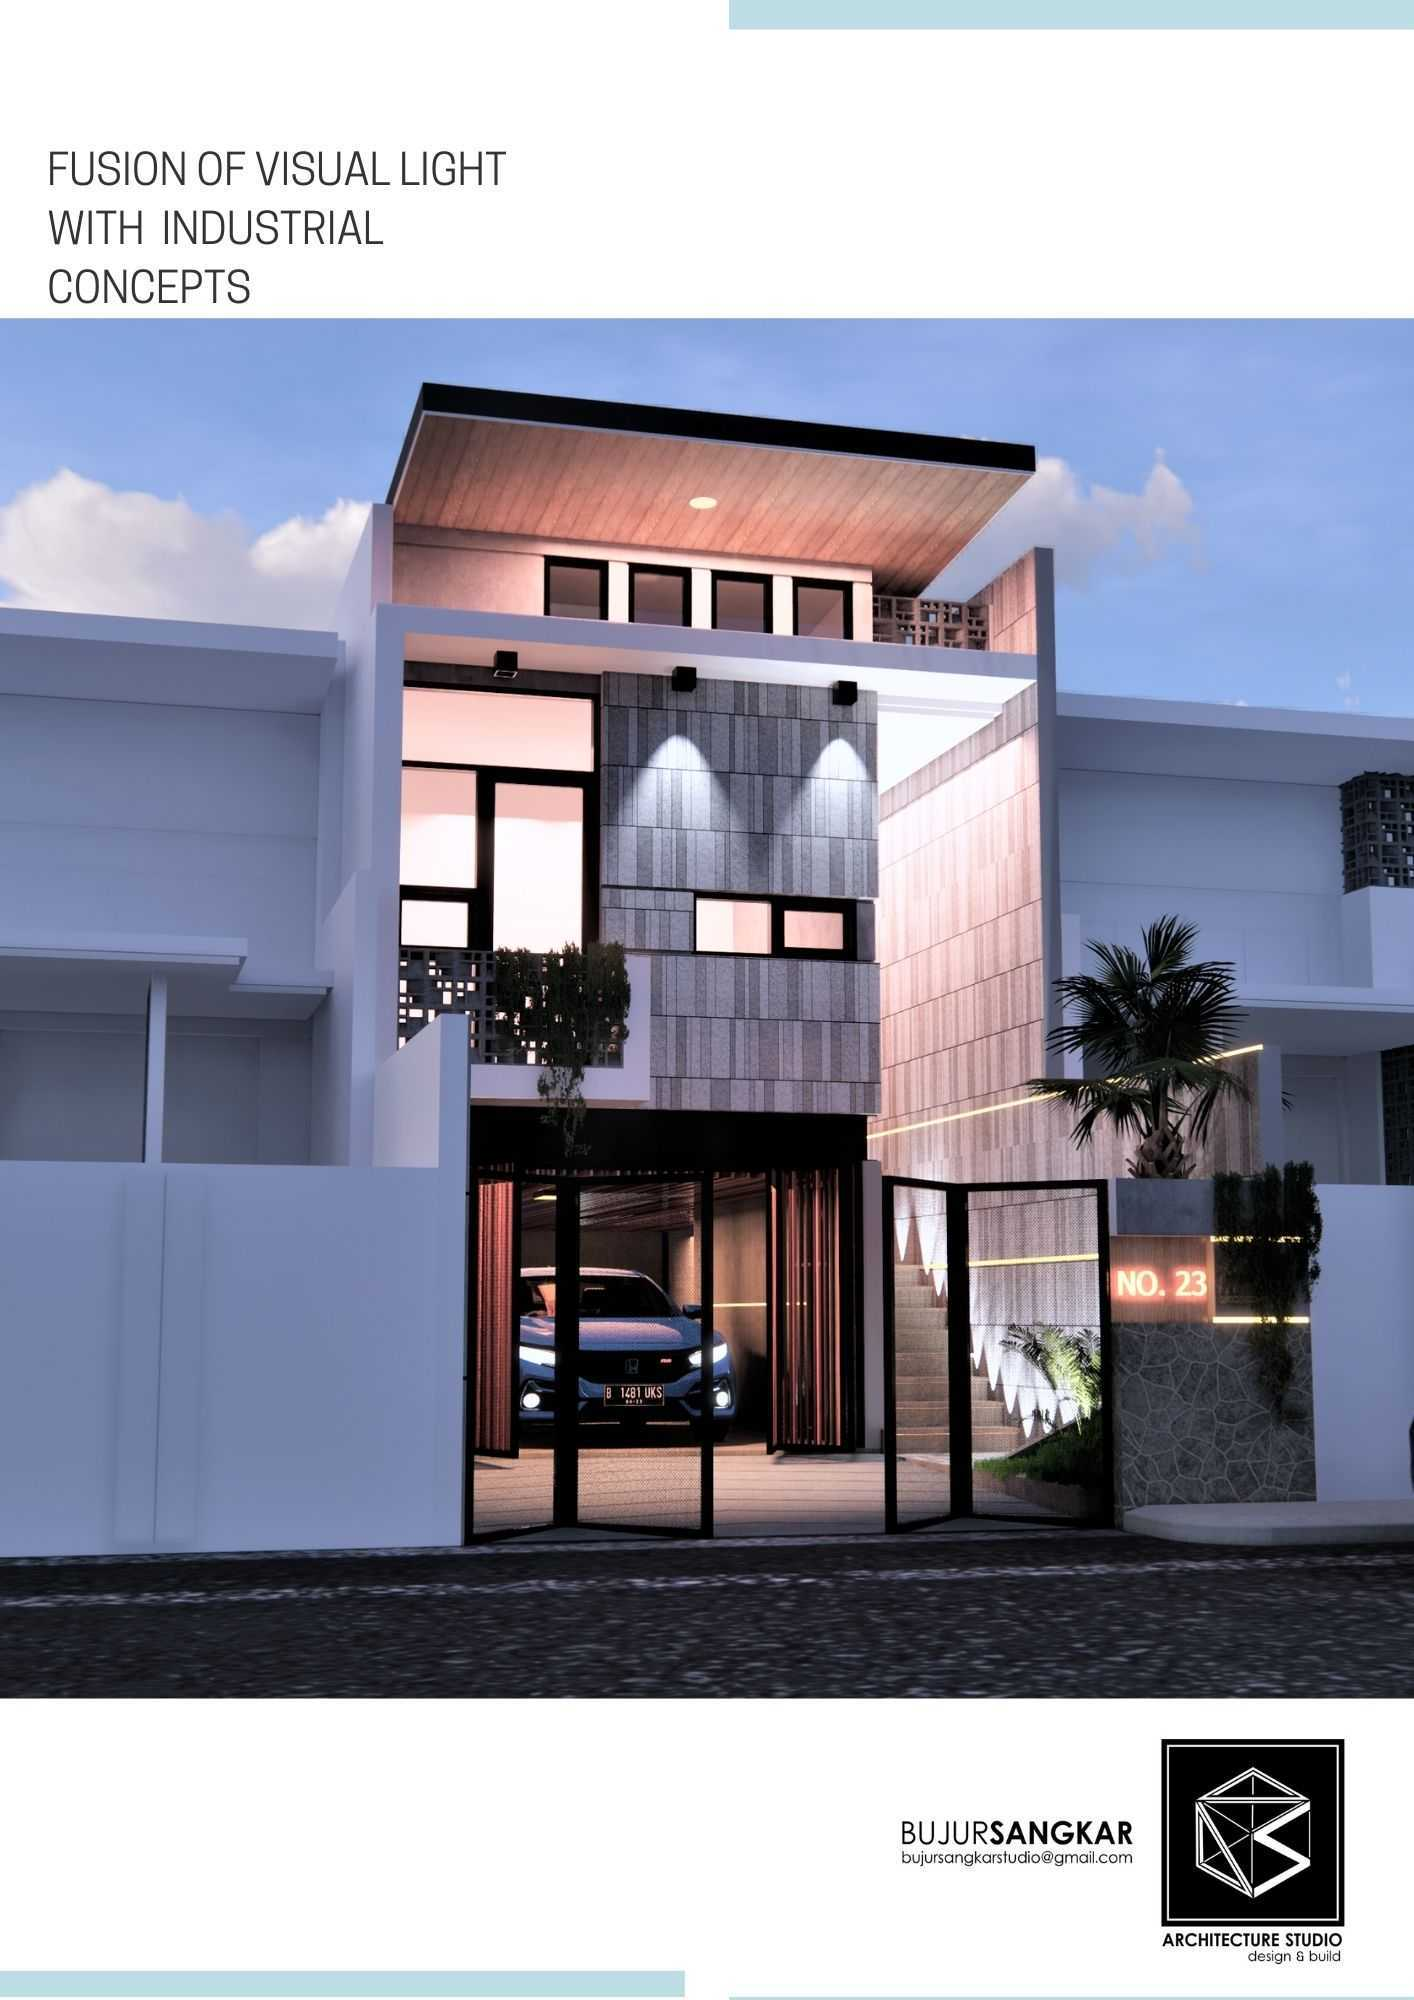 Bujursangkar Architect Fusion Of Visual Light With Industrial Concepts . Makassar, Kota Makassar, Sulawesi Selatan, Indonesia Makassar, Kota Makassar, Sulawesi Selatan, Indonesia Fusion Of Visual Light With Industrial Concepts Minimalist 111332